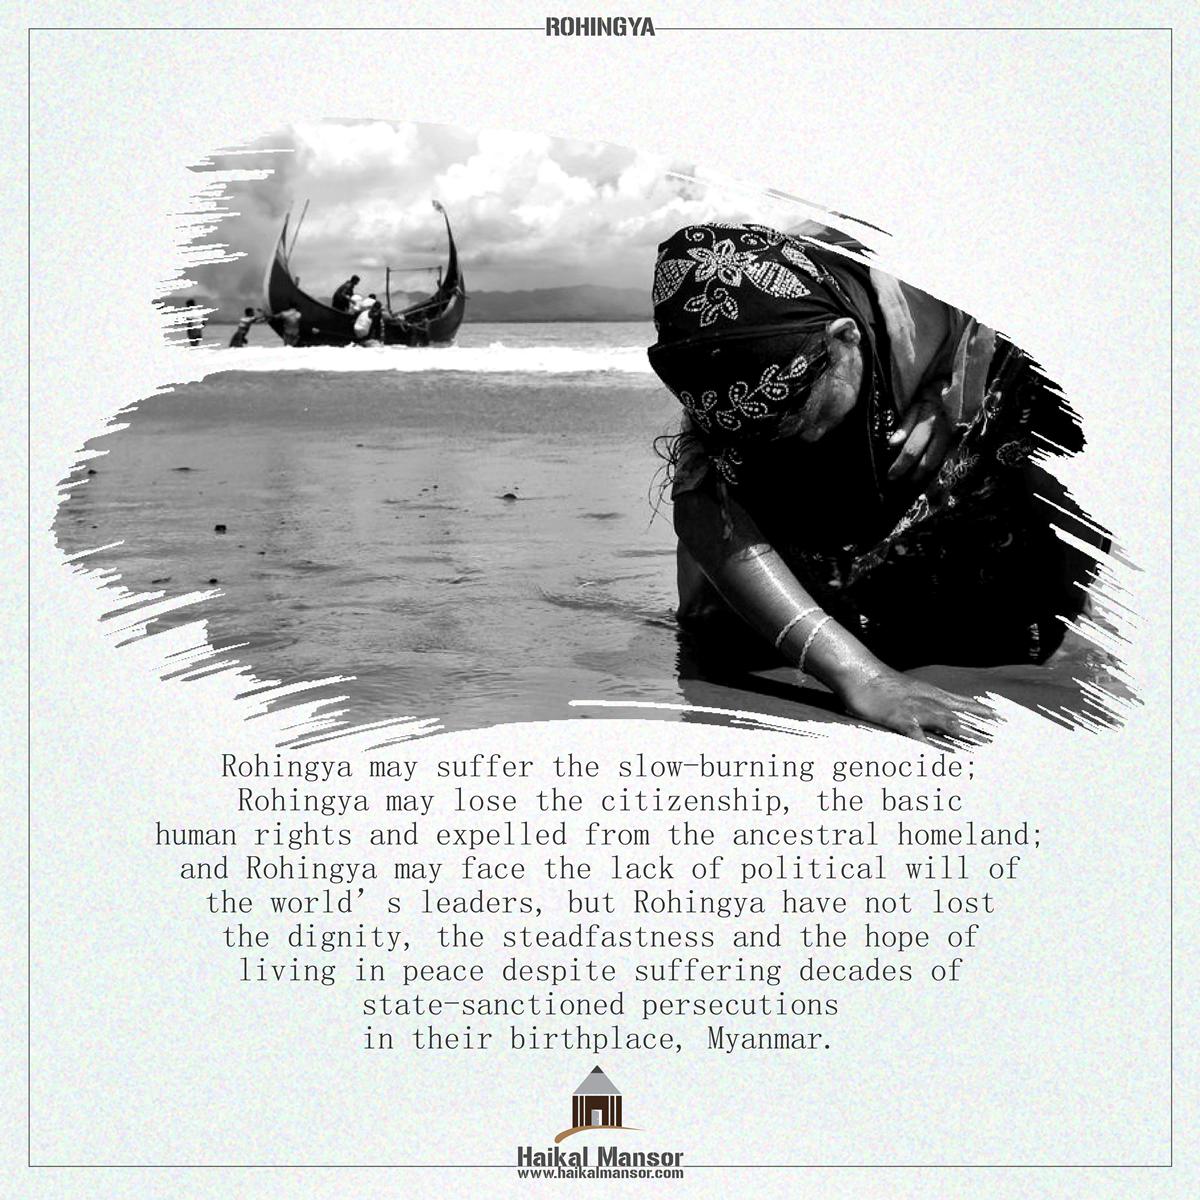 Dignity - The Rohingya-01-01-01